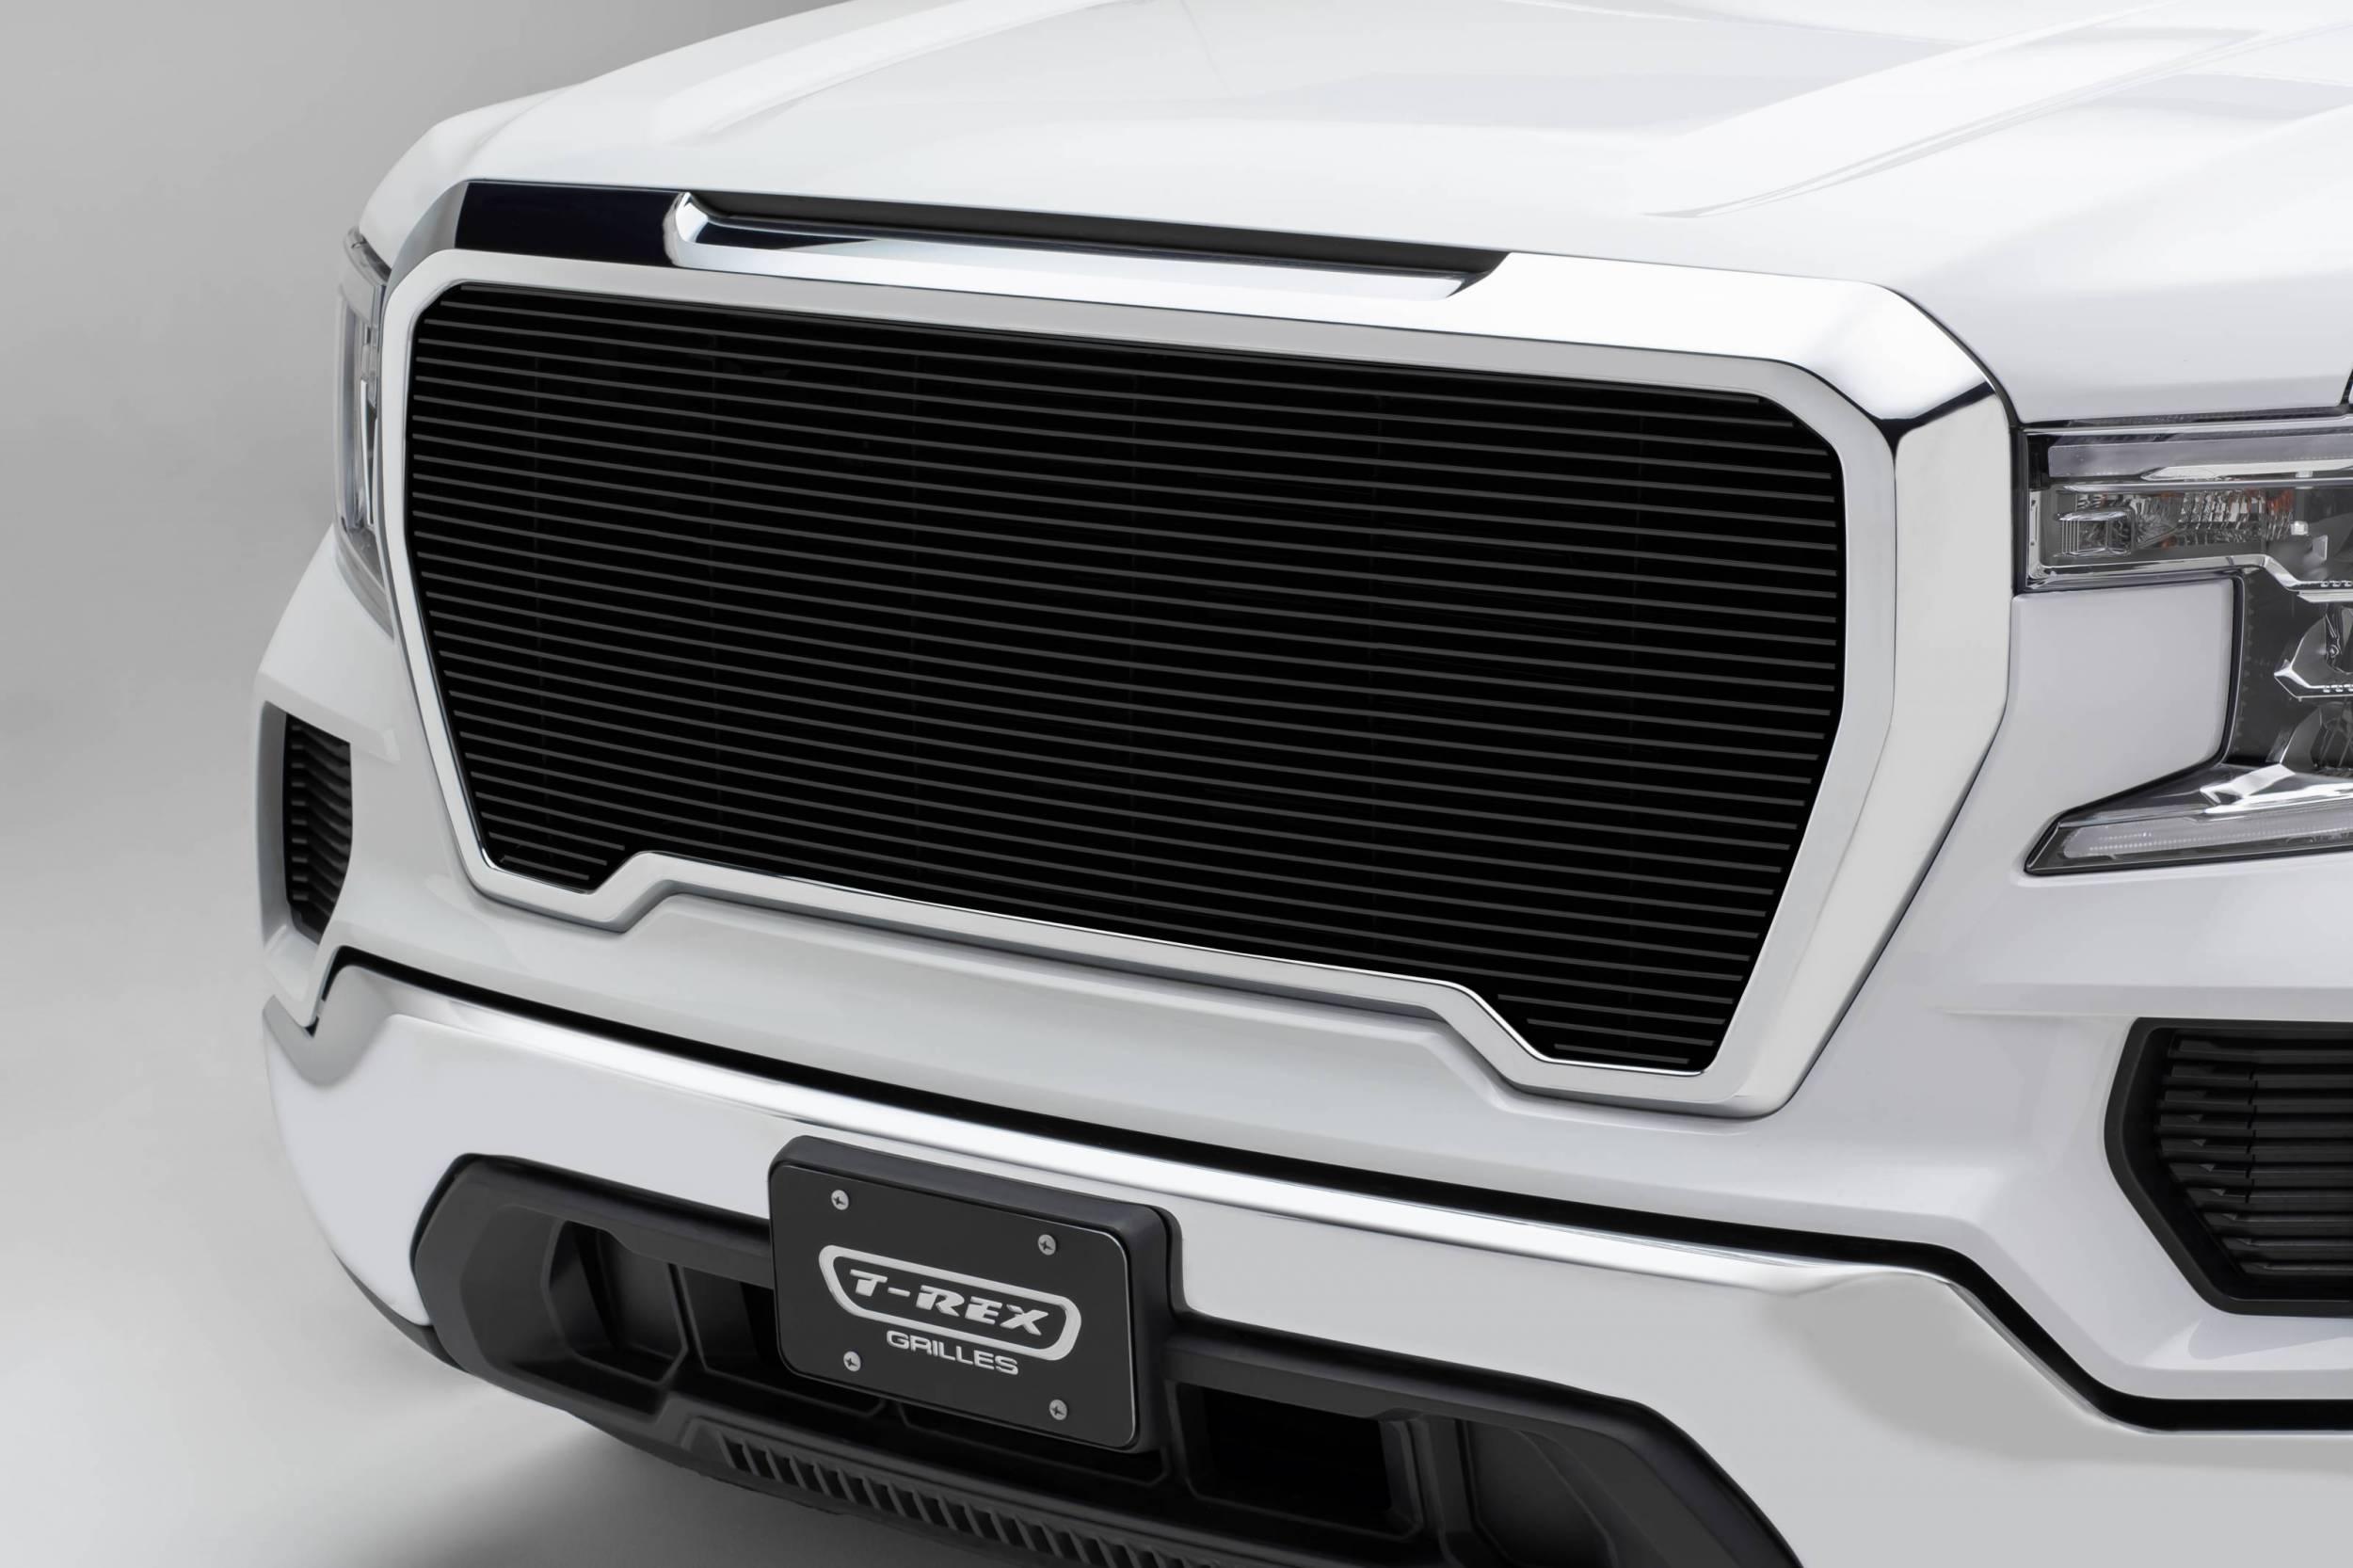 T-REX Grilles - 2019-2021 GMC Sierra 1500 Billet Grille, Black, Aluminum, 1 Pc, Insert - PN #20213B